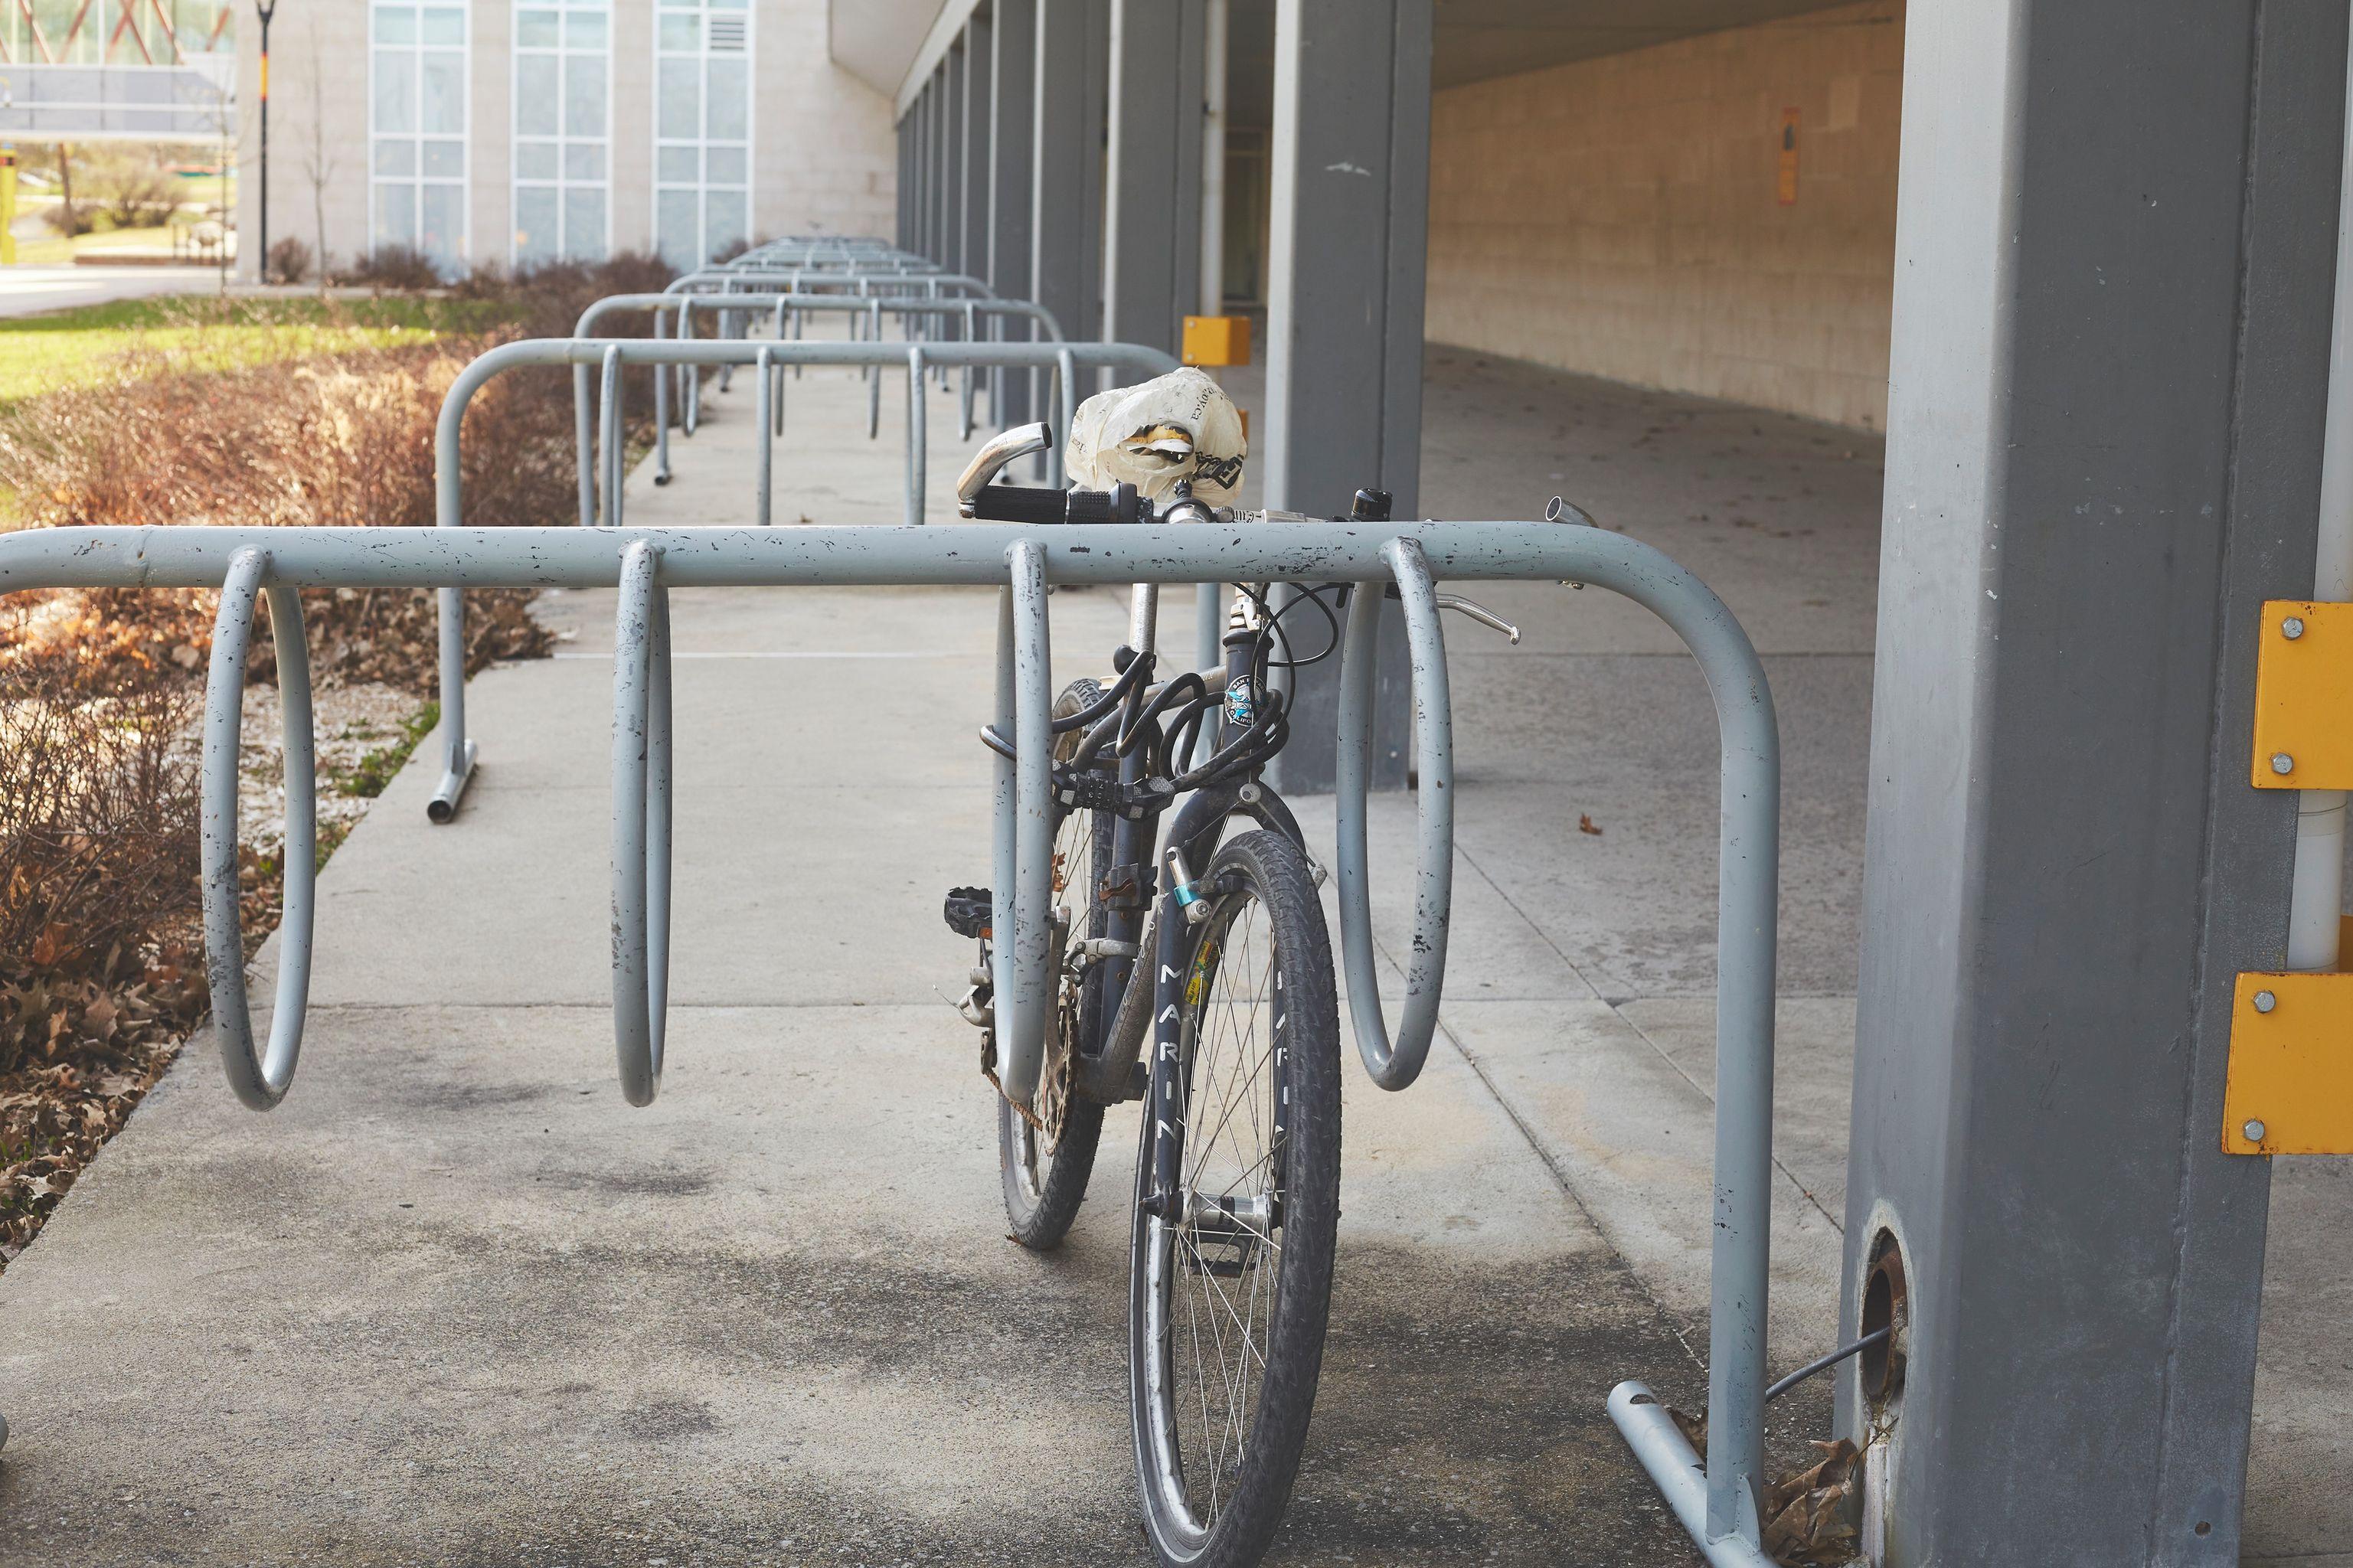 City kickstarts new bicycle parking plan, hits brakes on bike sharing